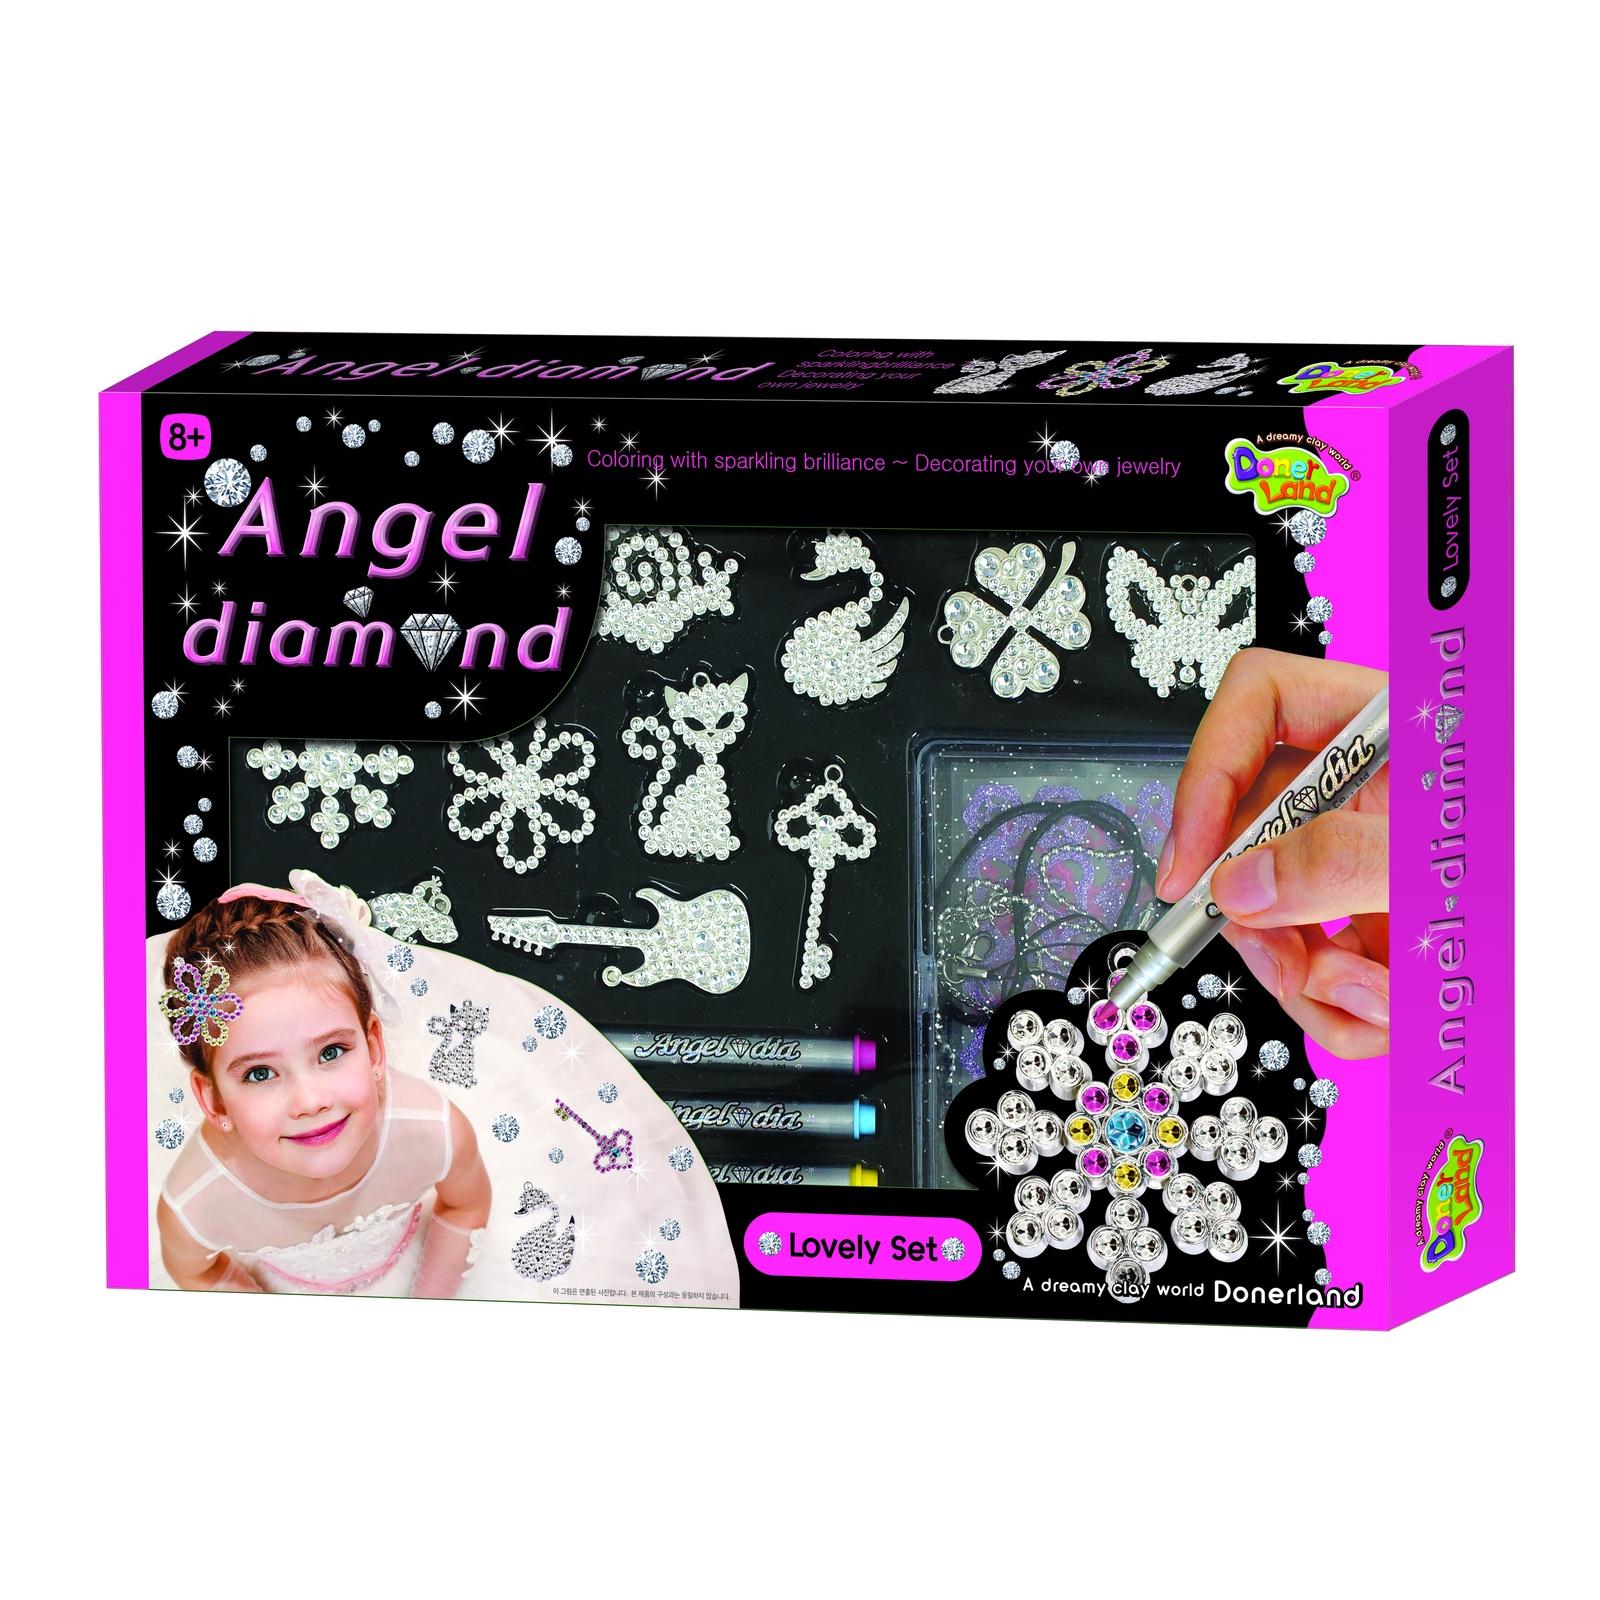 Набор для создания украшений Donerland Angel Diamond - Lovely Set